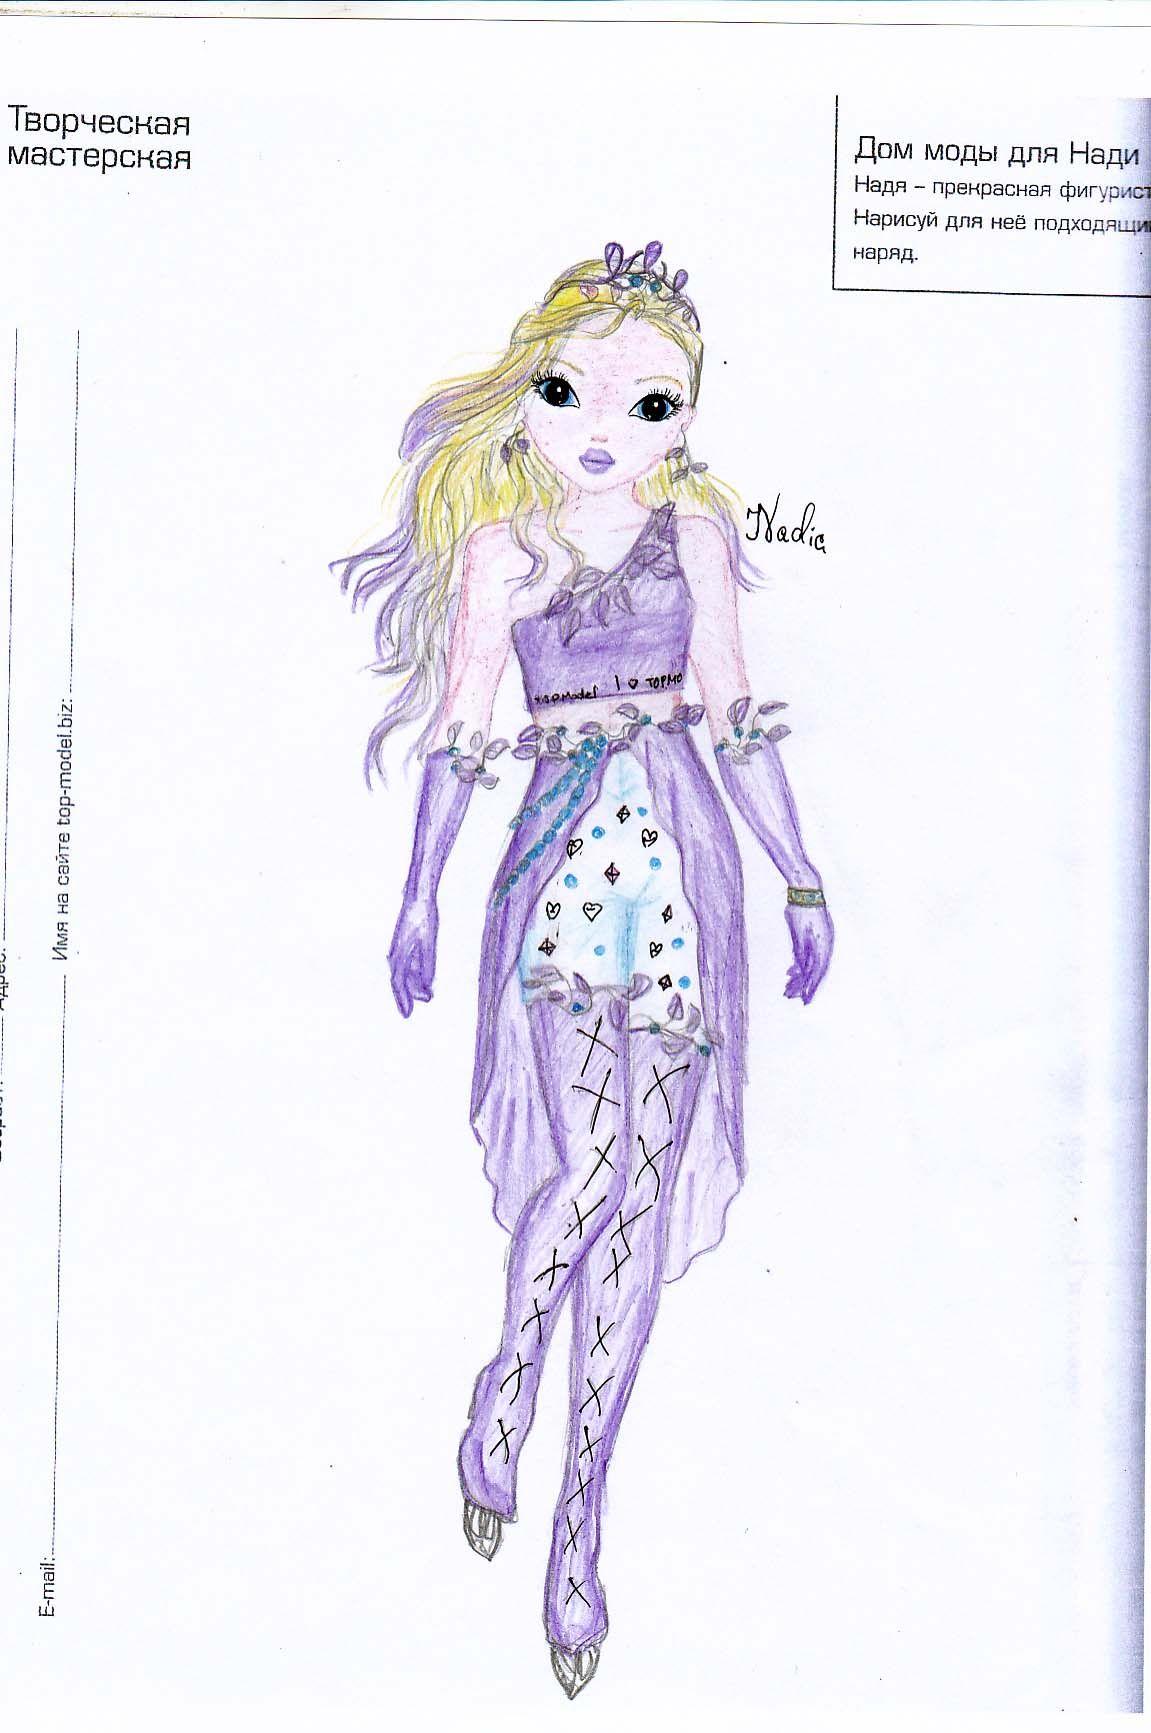 Marina M., 11 Jahre